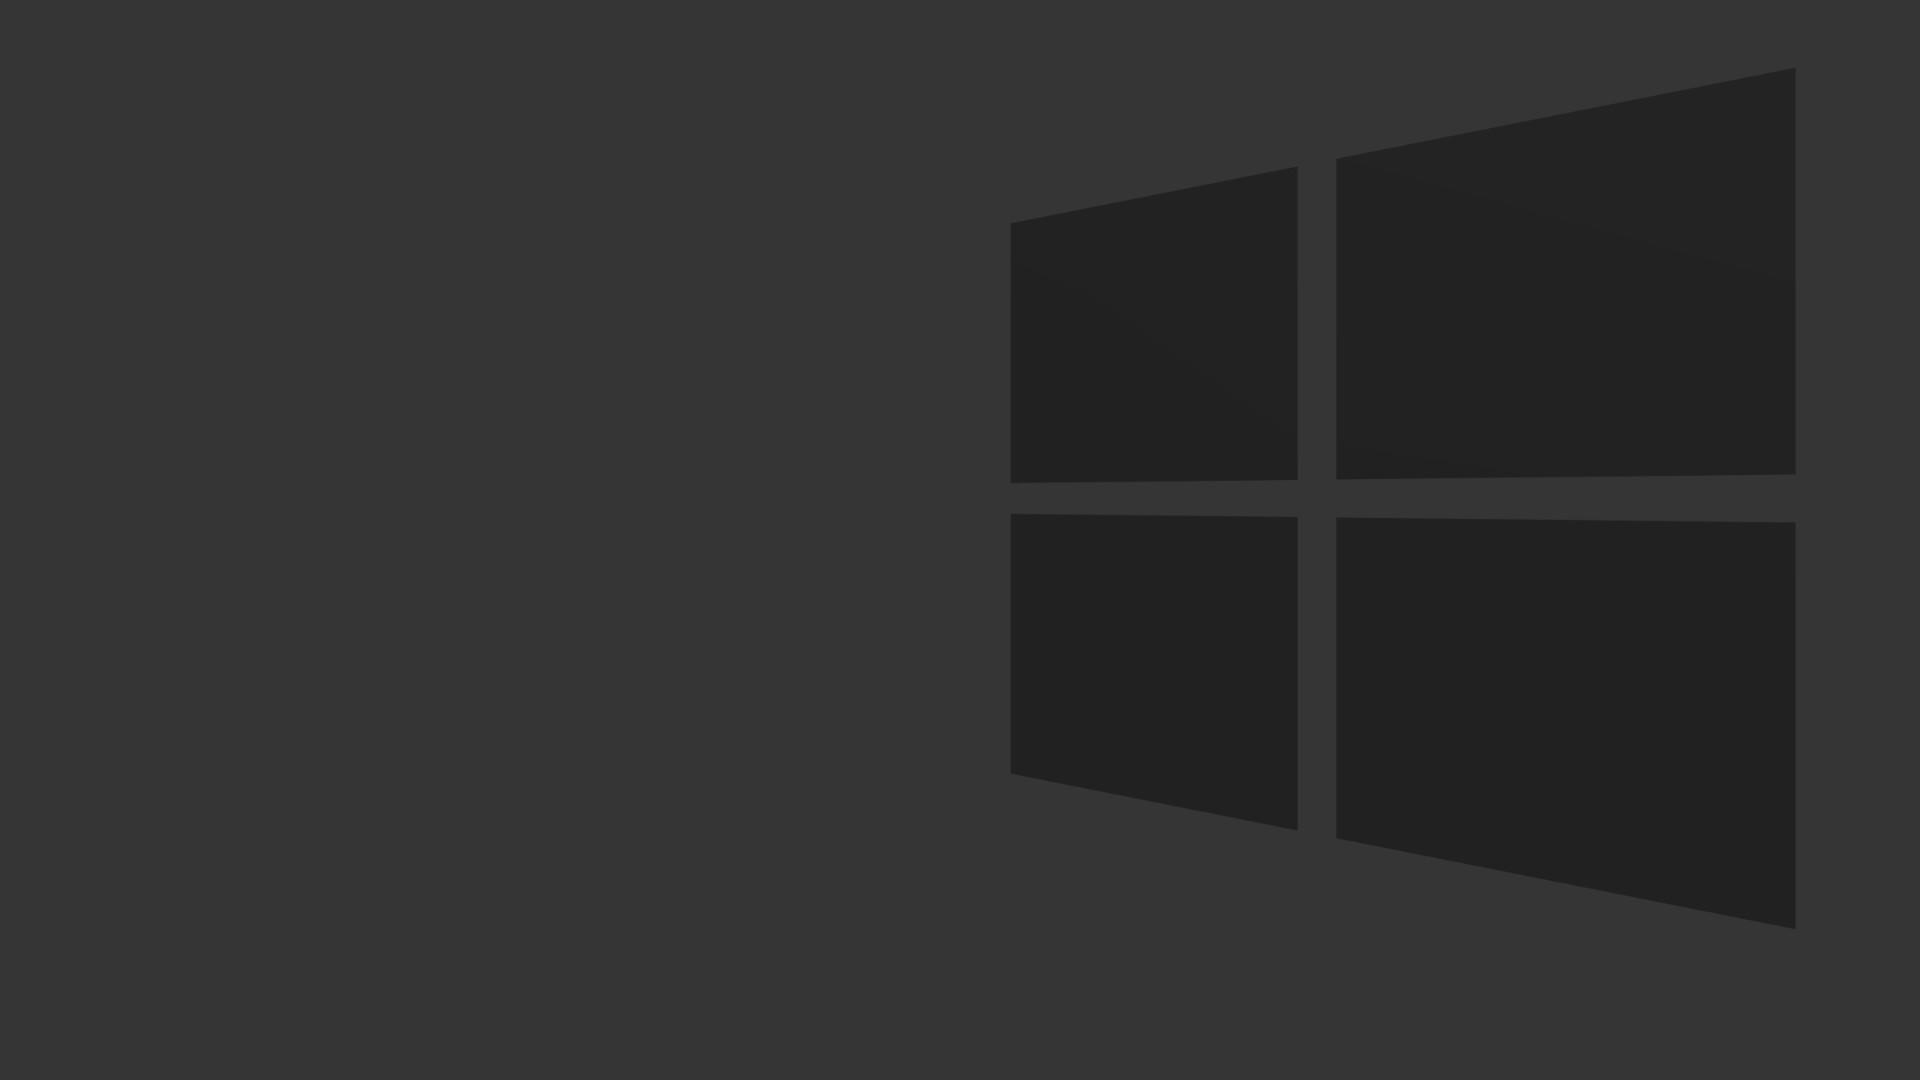 Windows 8 Black Wallpaper 58 Pictures